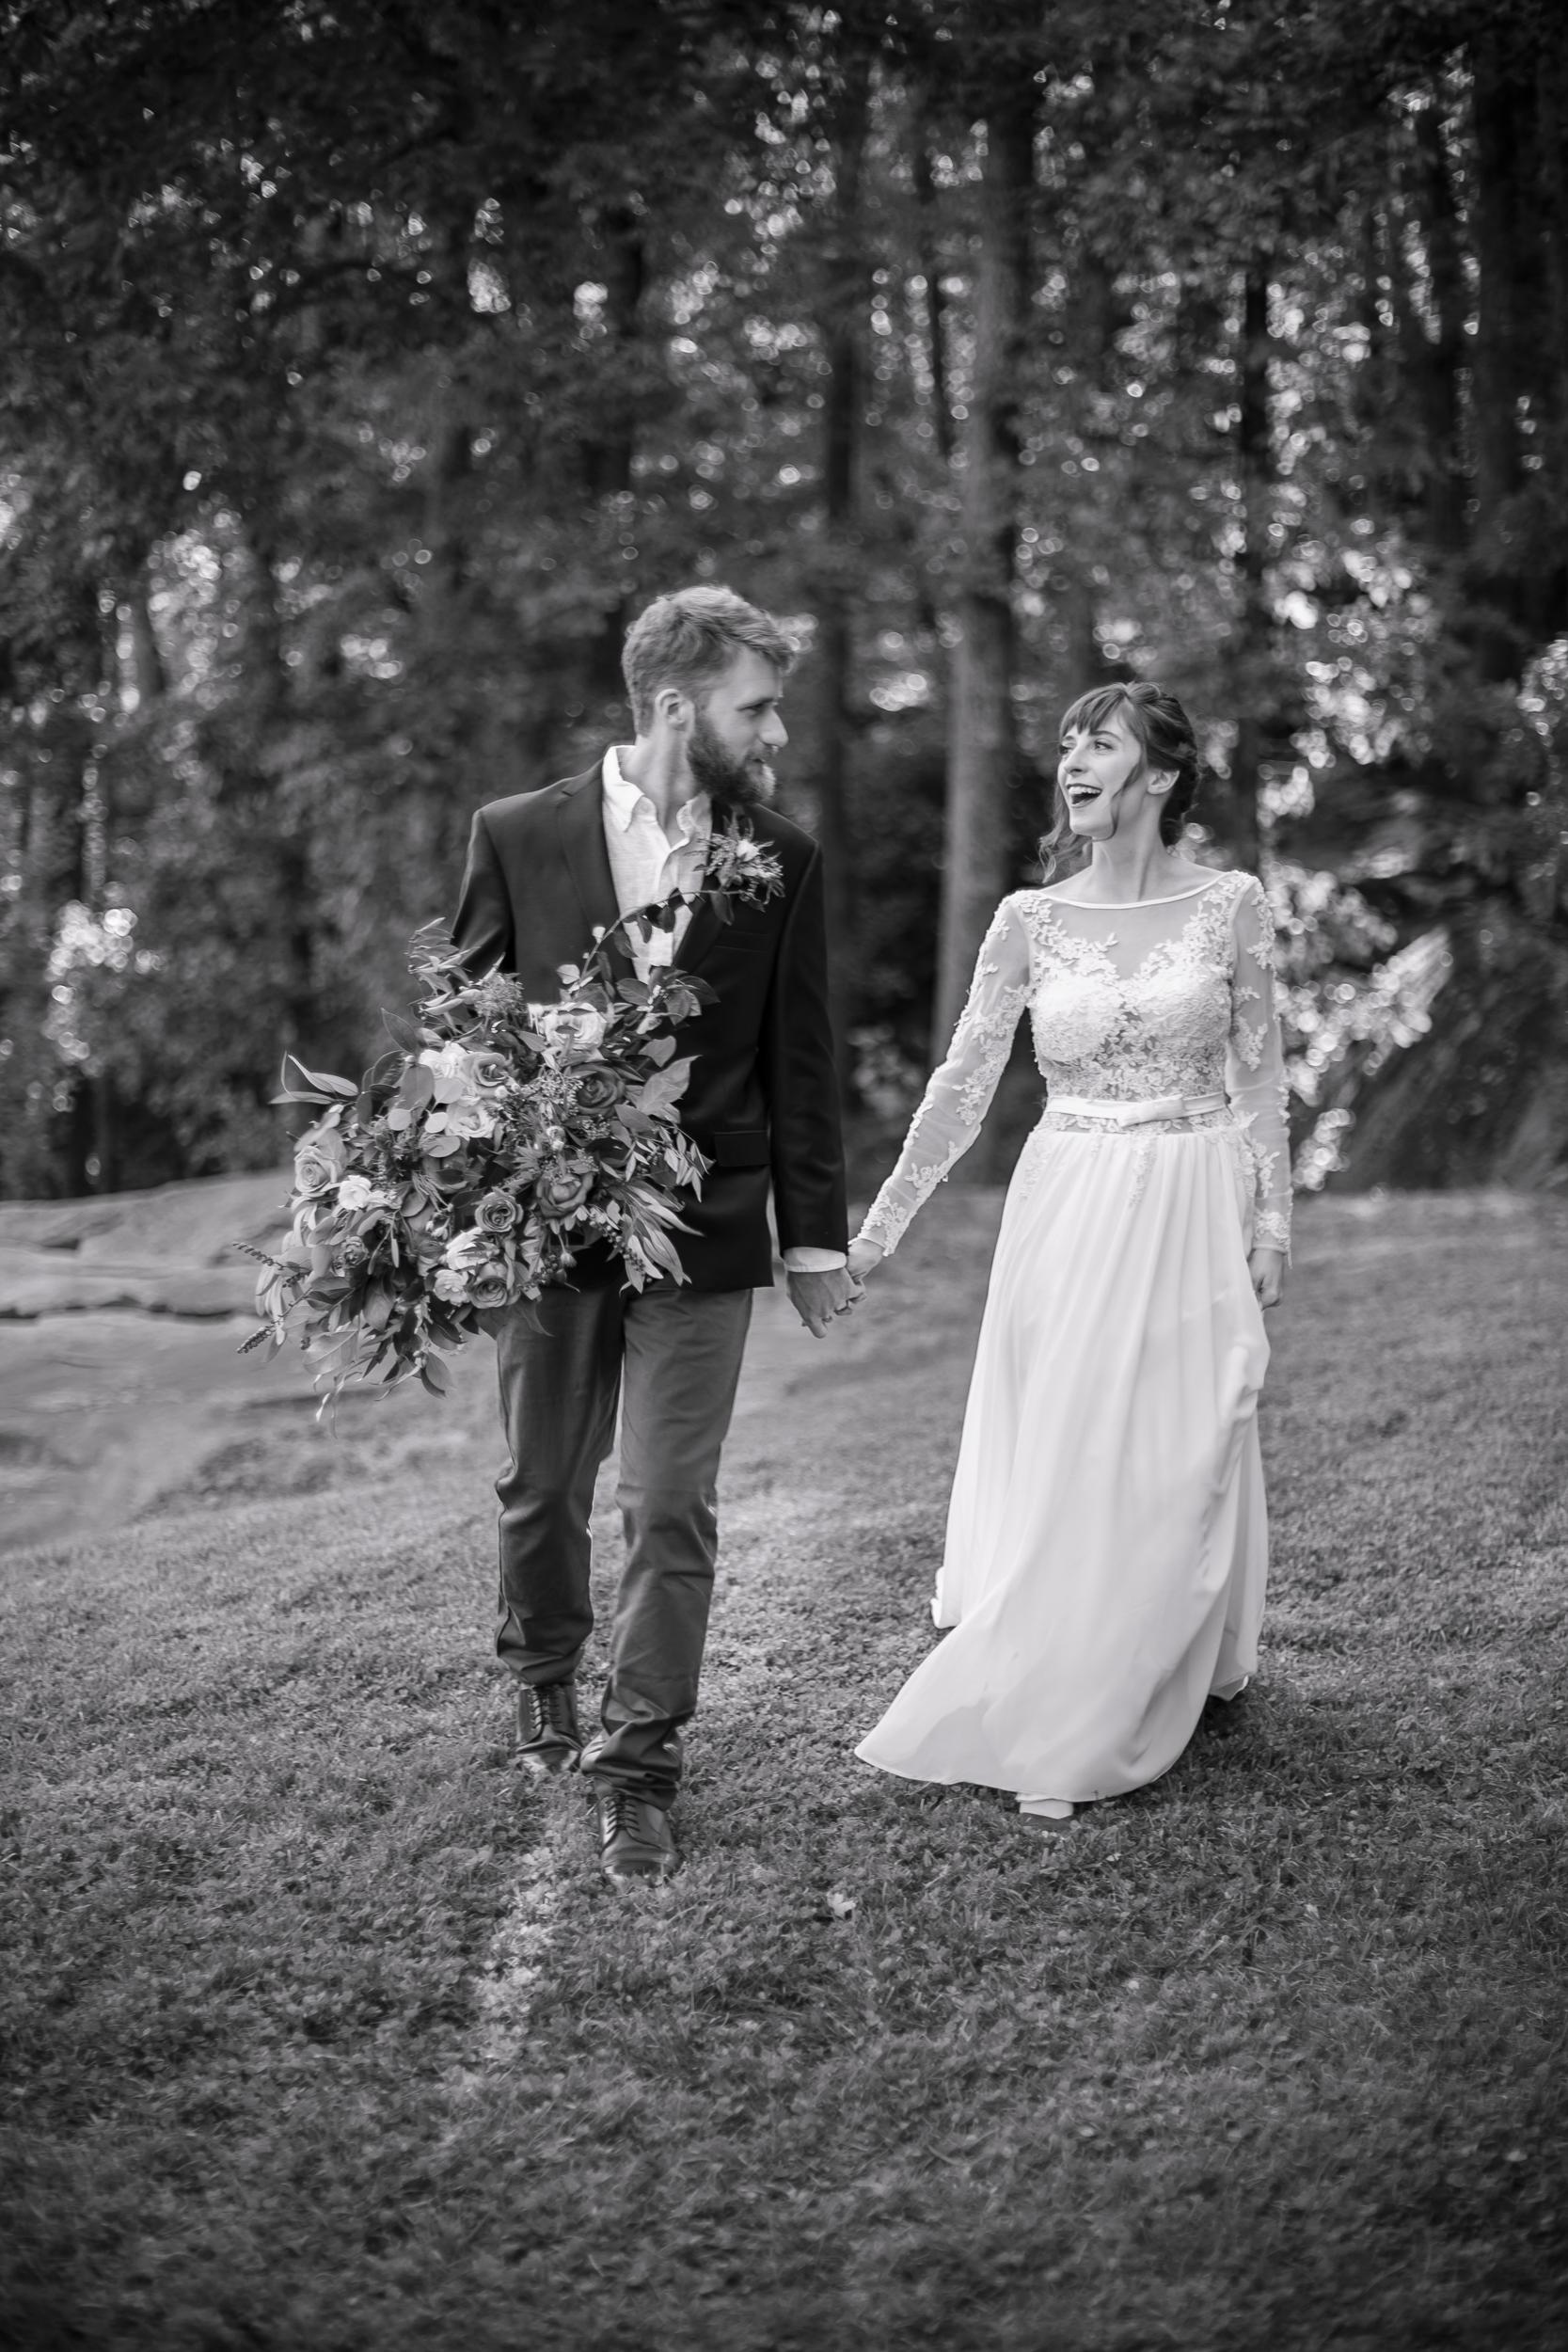 Laurel Falls Wedding October 2018_Allison and Josh__Lola Salon_Flora_Photo by Studio Misha Photography-51.jpg